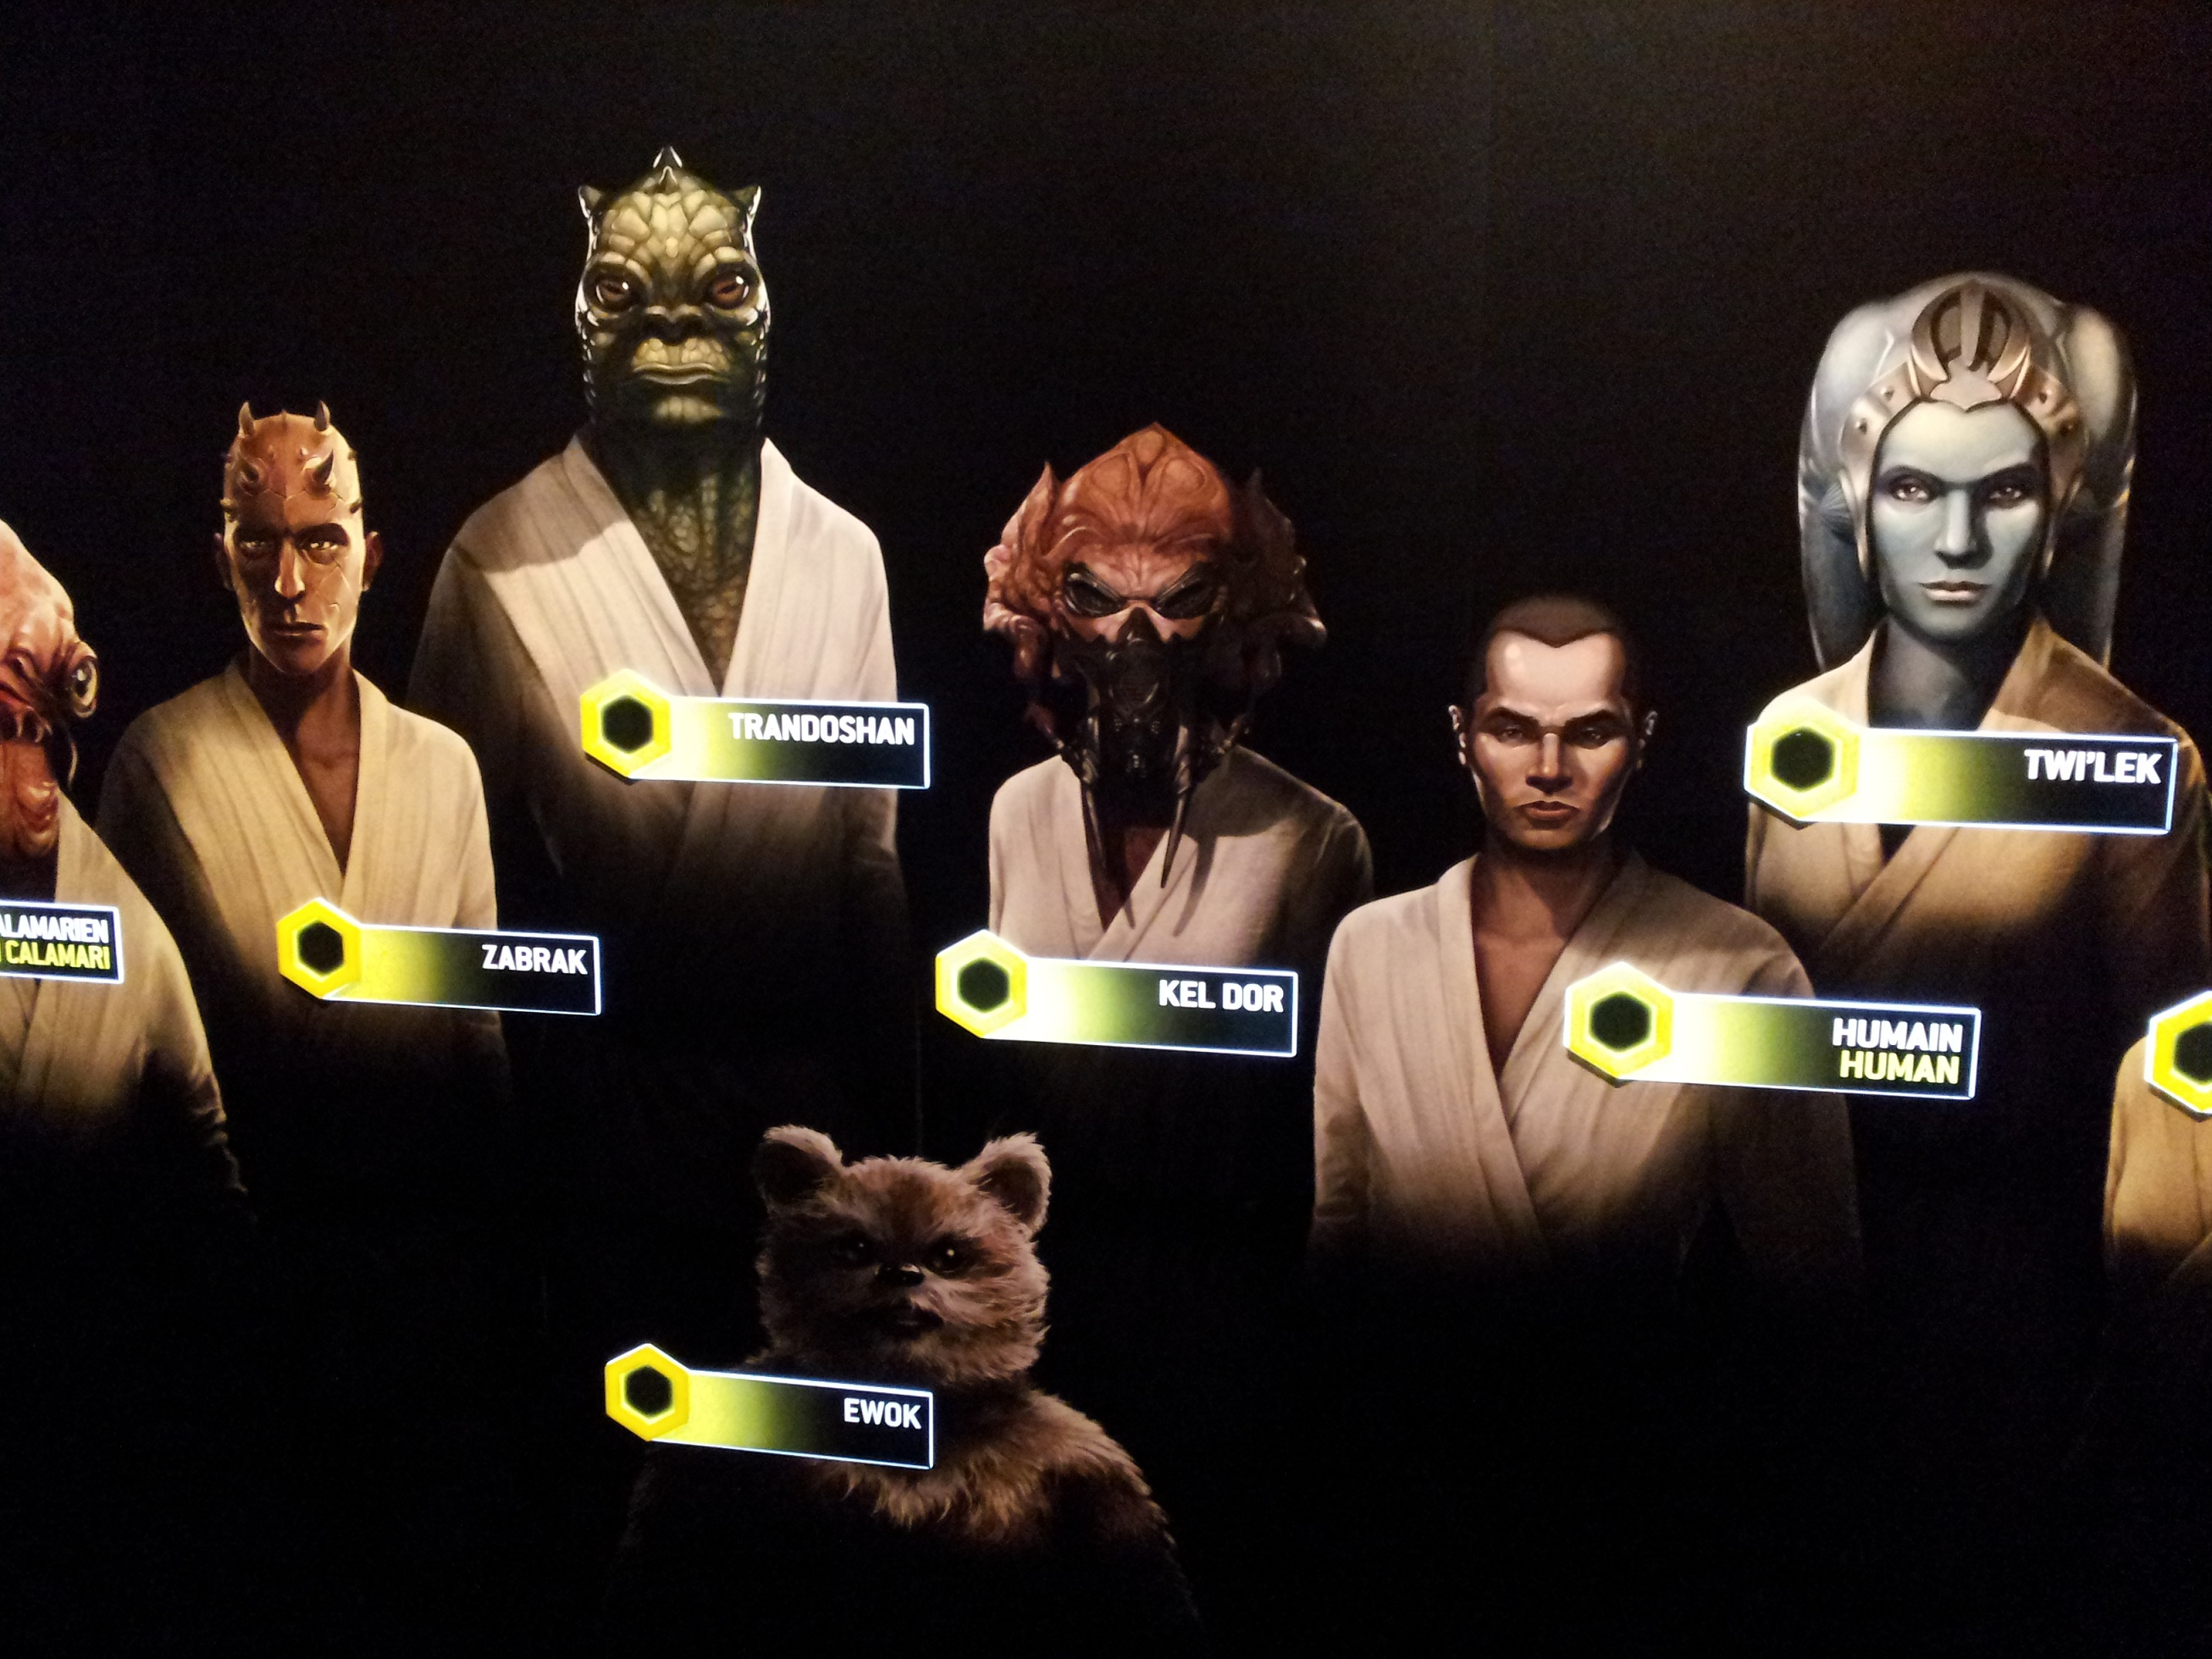 Avis sur star wars identit s l 39 exposition interactive - Personnage de starwars ...